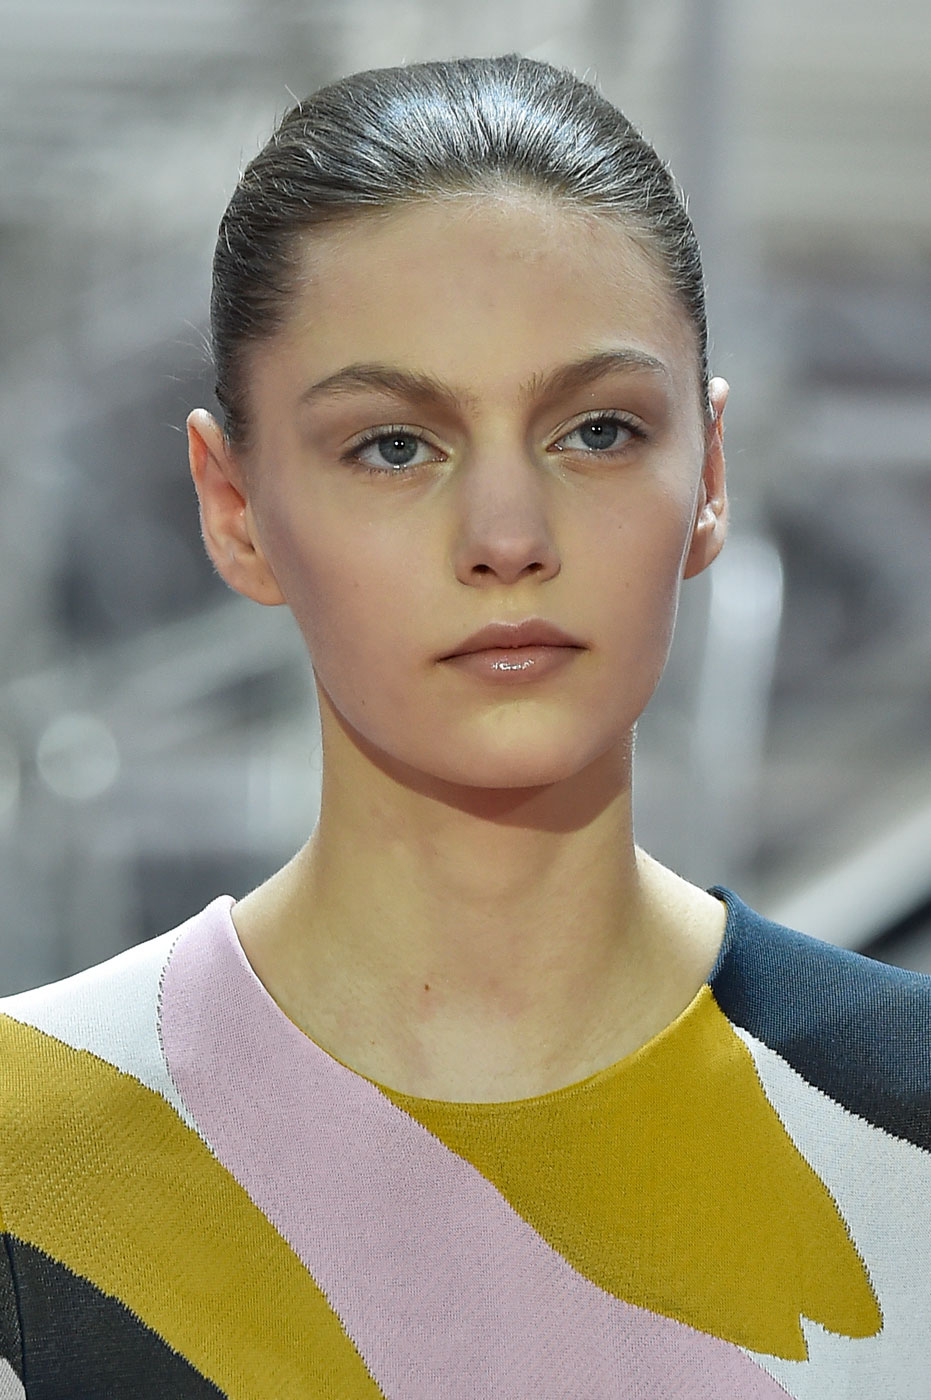 Christian-Dior-fashion-runway-show-close-ups-haute-couture-paris-spring-summer-2015-the-impression-047